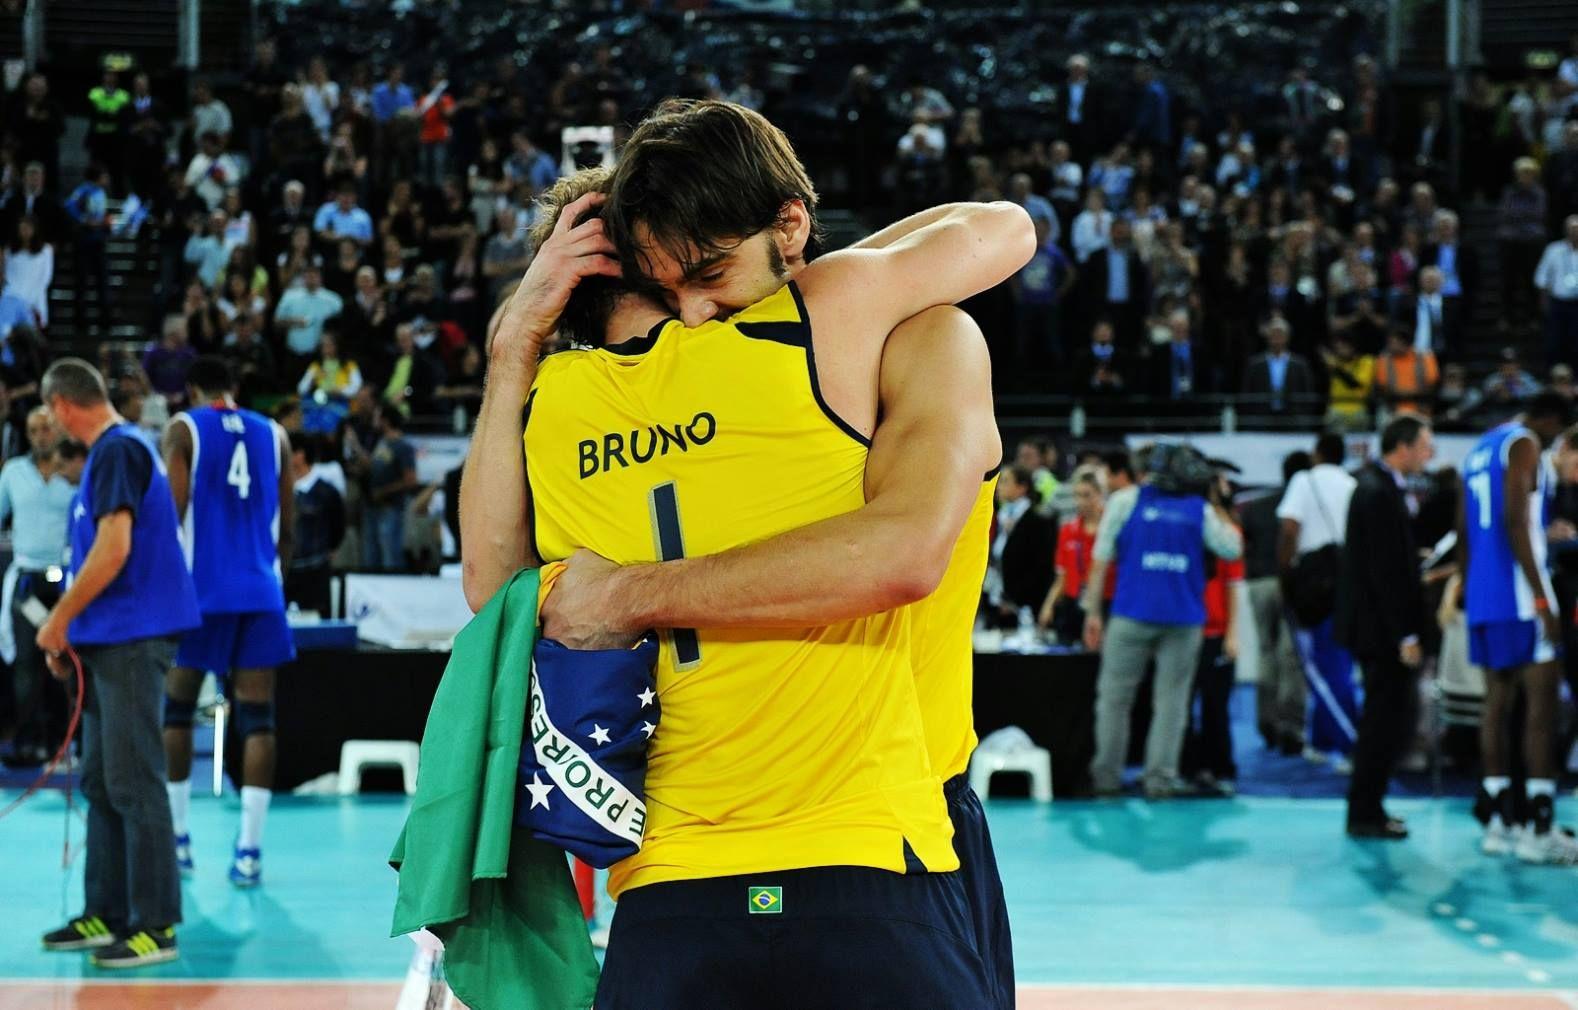 Brazil Bruno 1 Giba 7 Volei